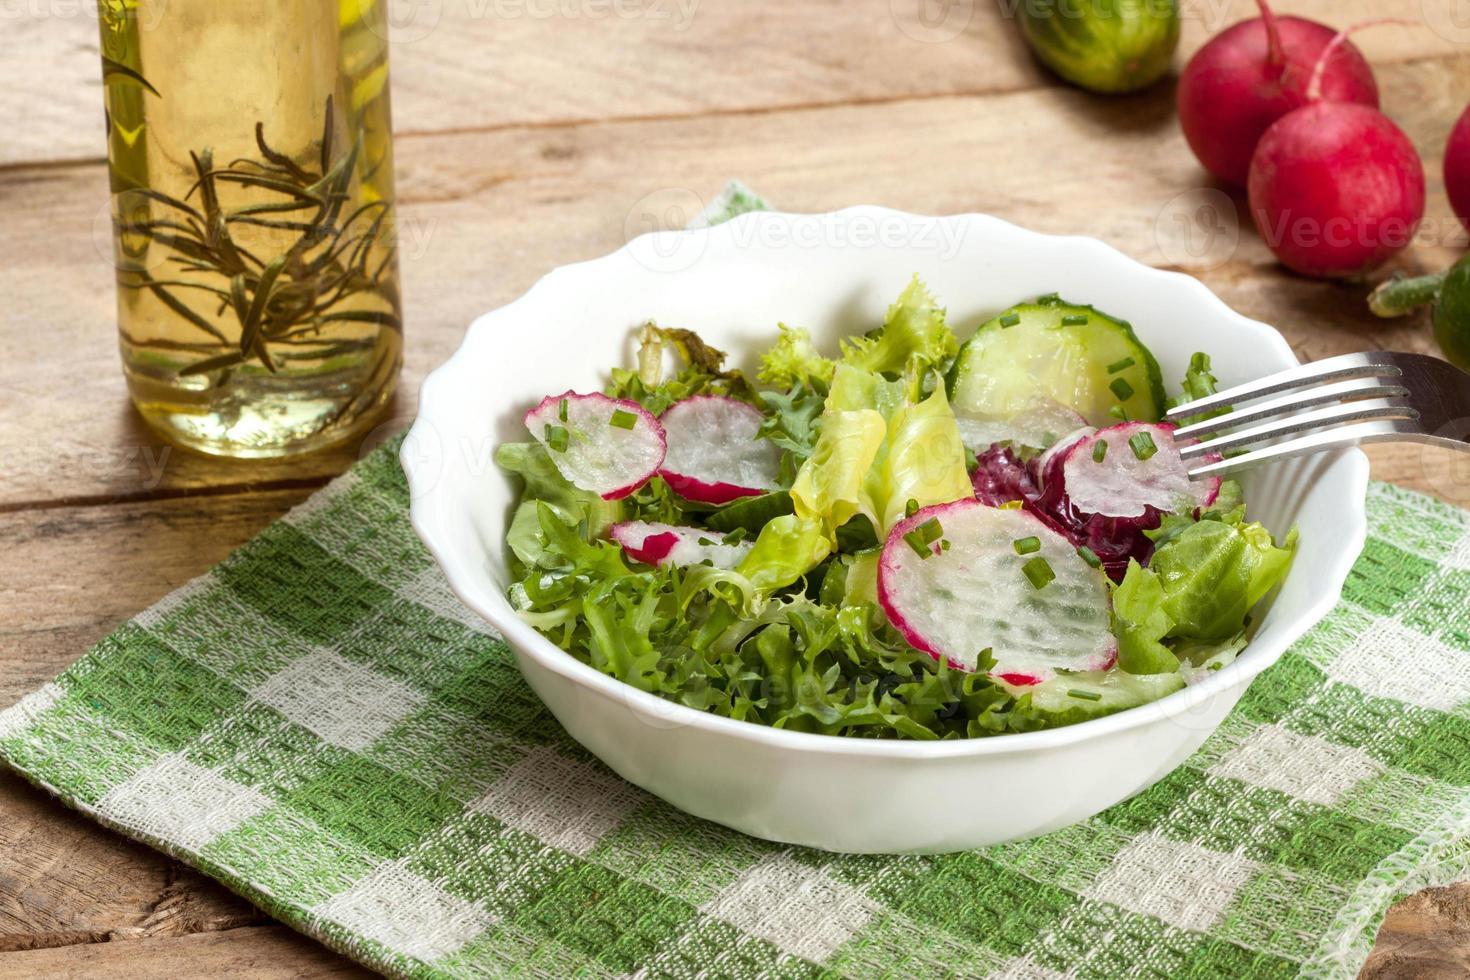 Salad with radish and green cucumber photo